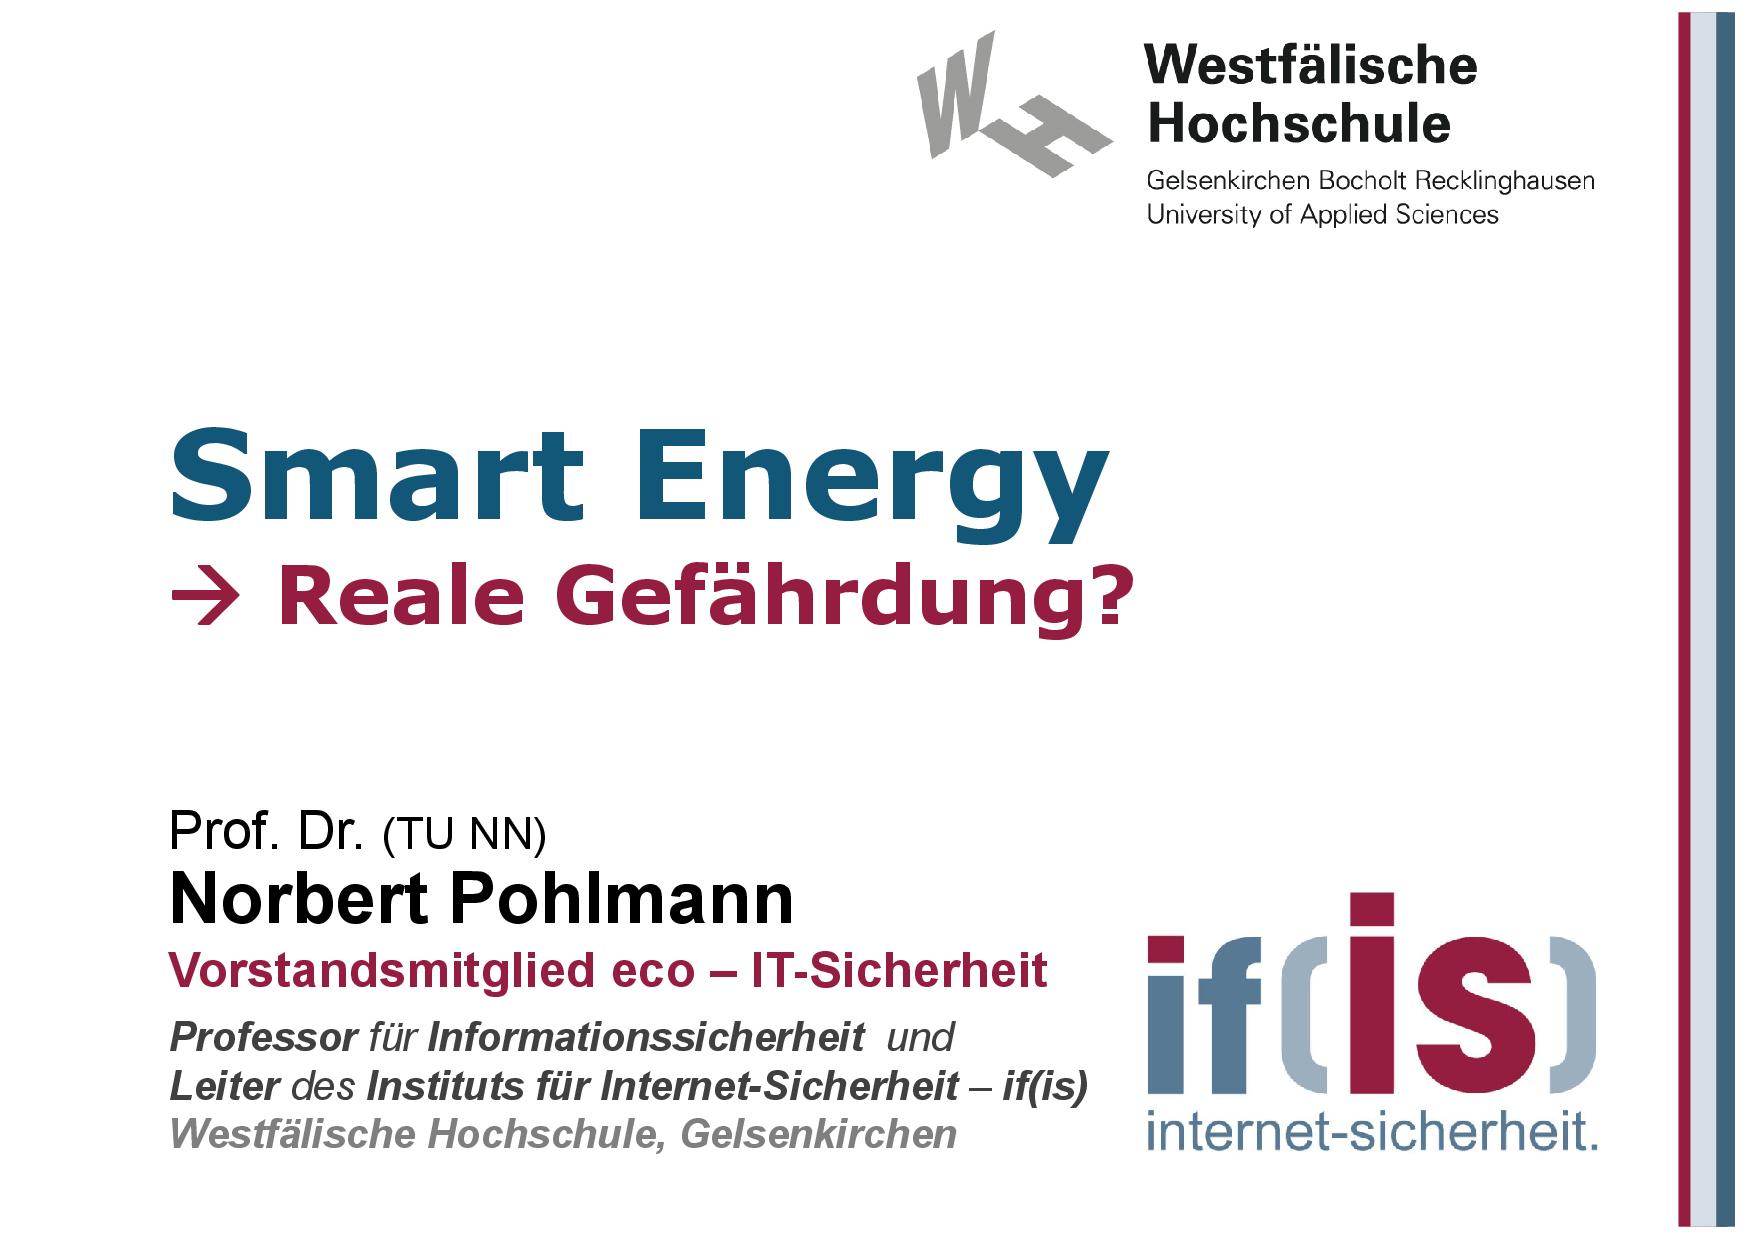 390 - Smart Energy - Reale Gefährdung - Cyber-Sicherheit - Prof Norbert Pohlmann-001